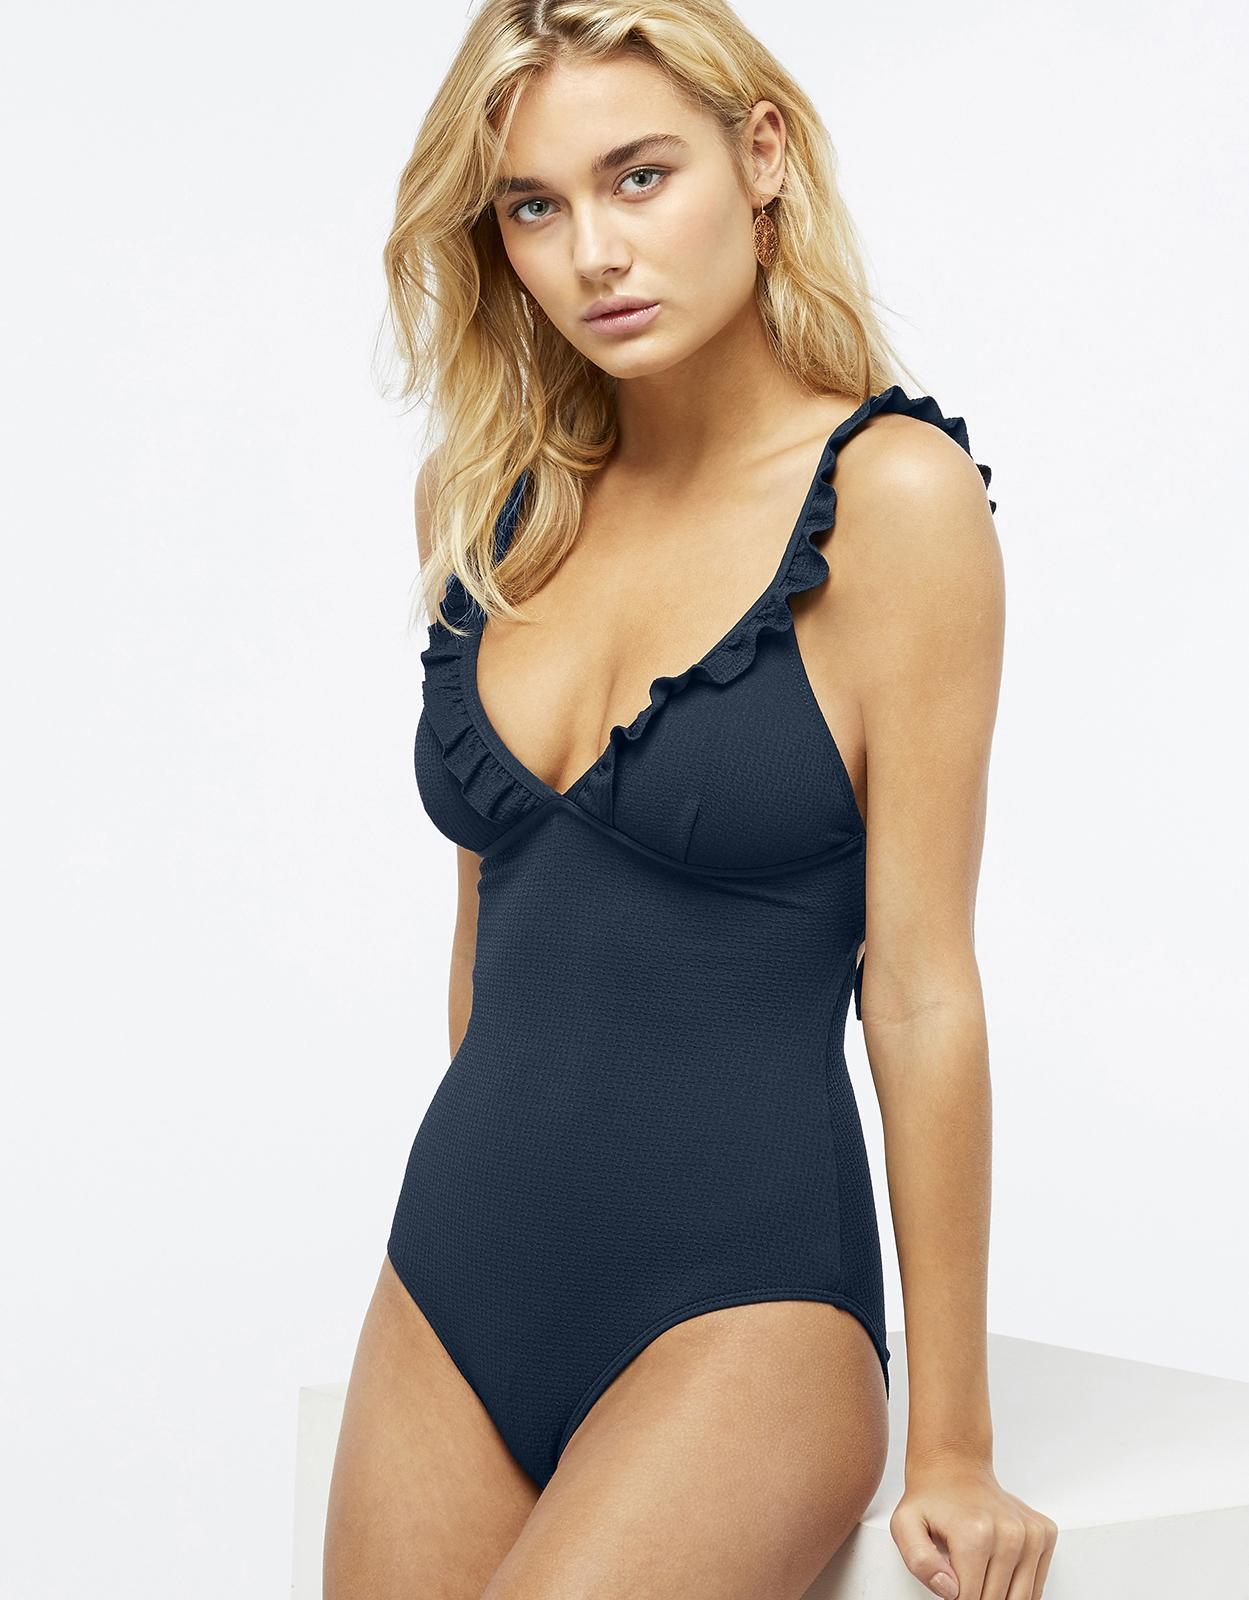 4b7c7f6ce3 Accessorize Ruffle Swimsuit in Blue - Lyst